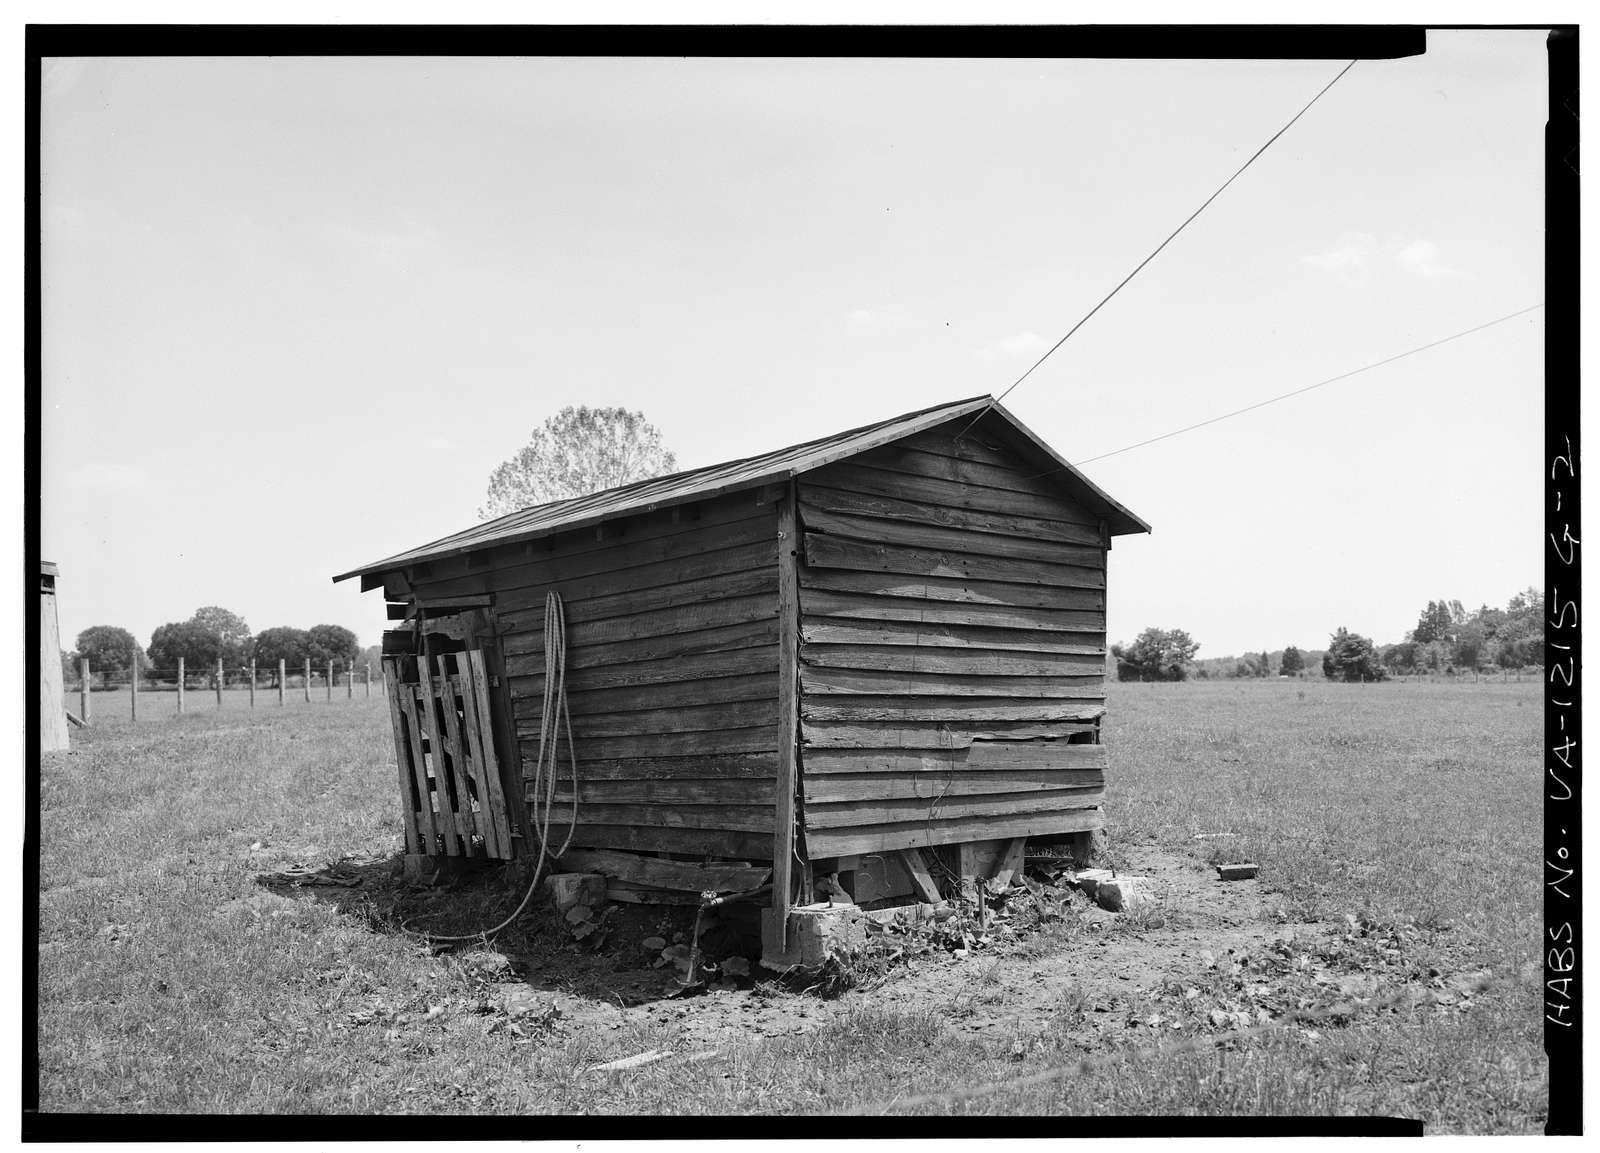 Bracketts Farm, Storage Shed, Routes 638 & 640 vicinity, Trevilians, Louisa County, VA